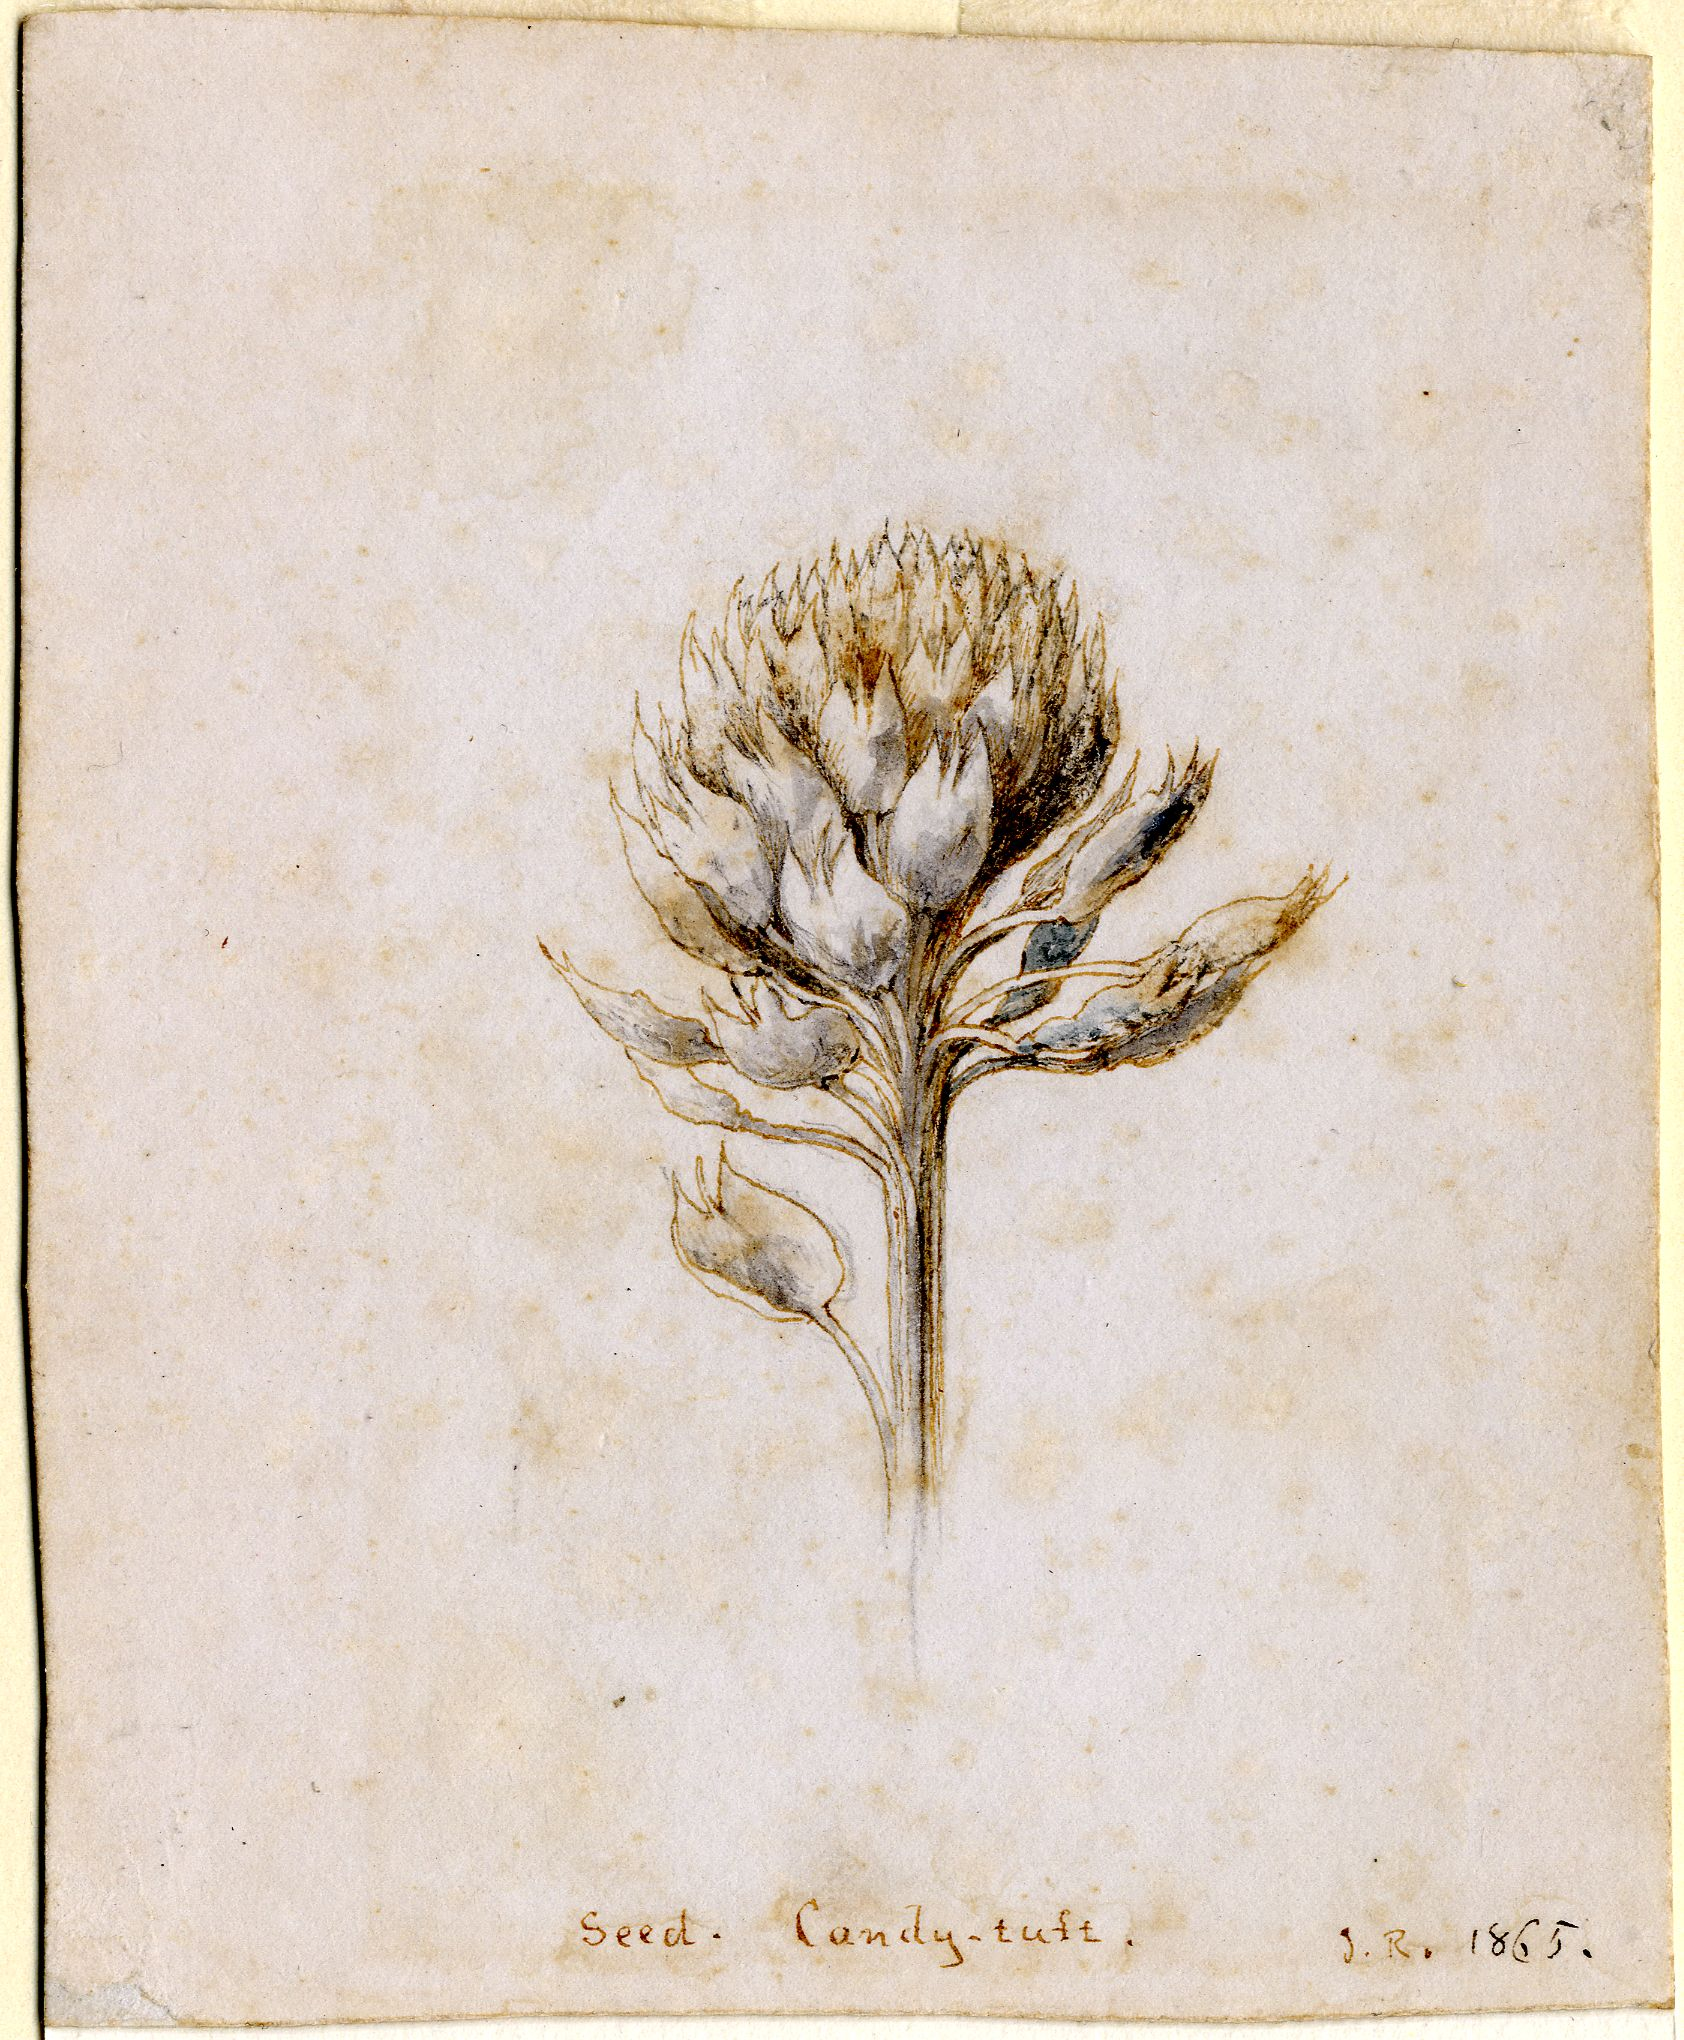 John Ruskin, Candytuft  1865, RF1525 © Ruskin Foundation